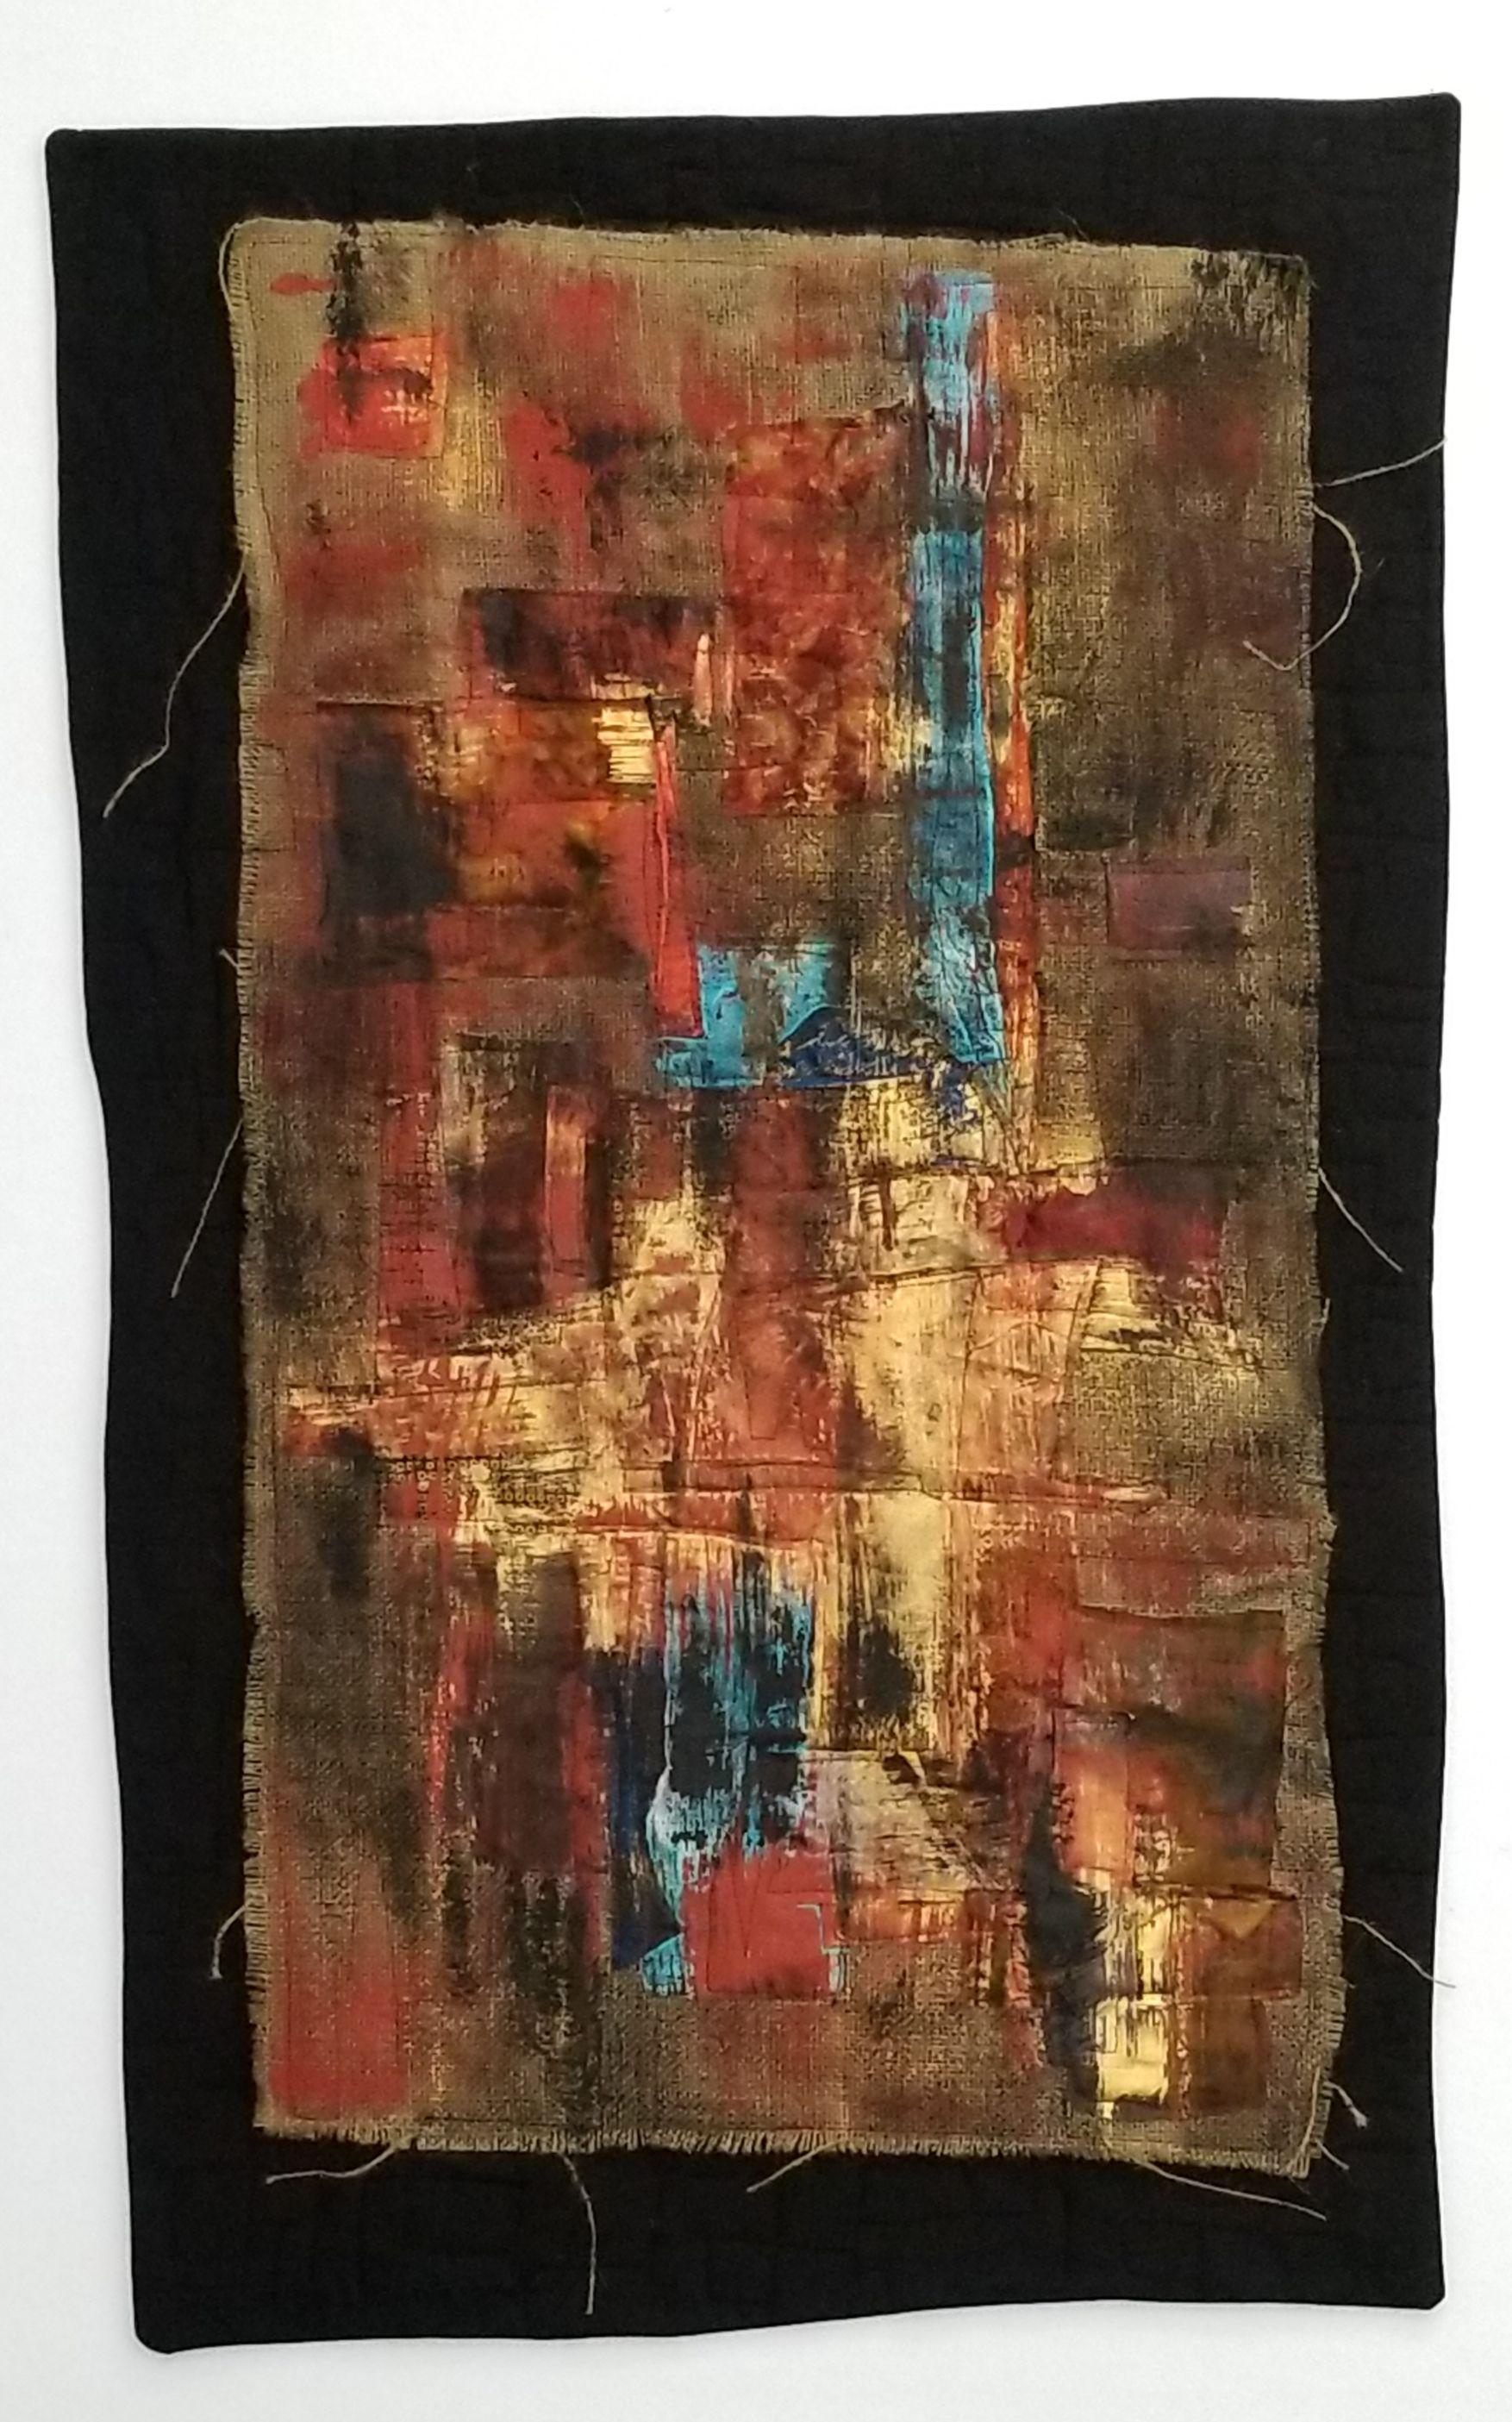 Urban Decay Textile texture, Art quilts, Textile artists